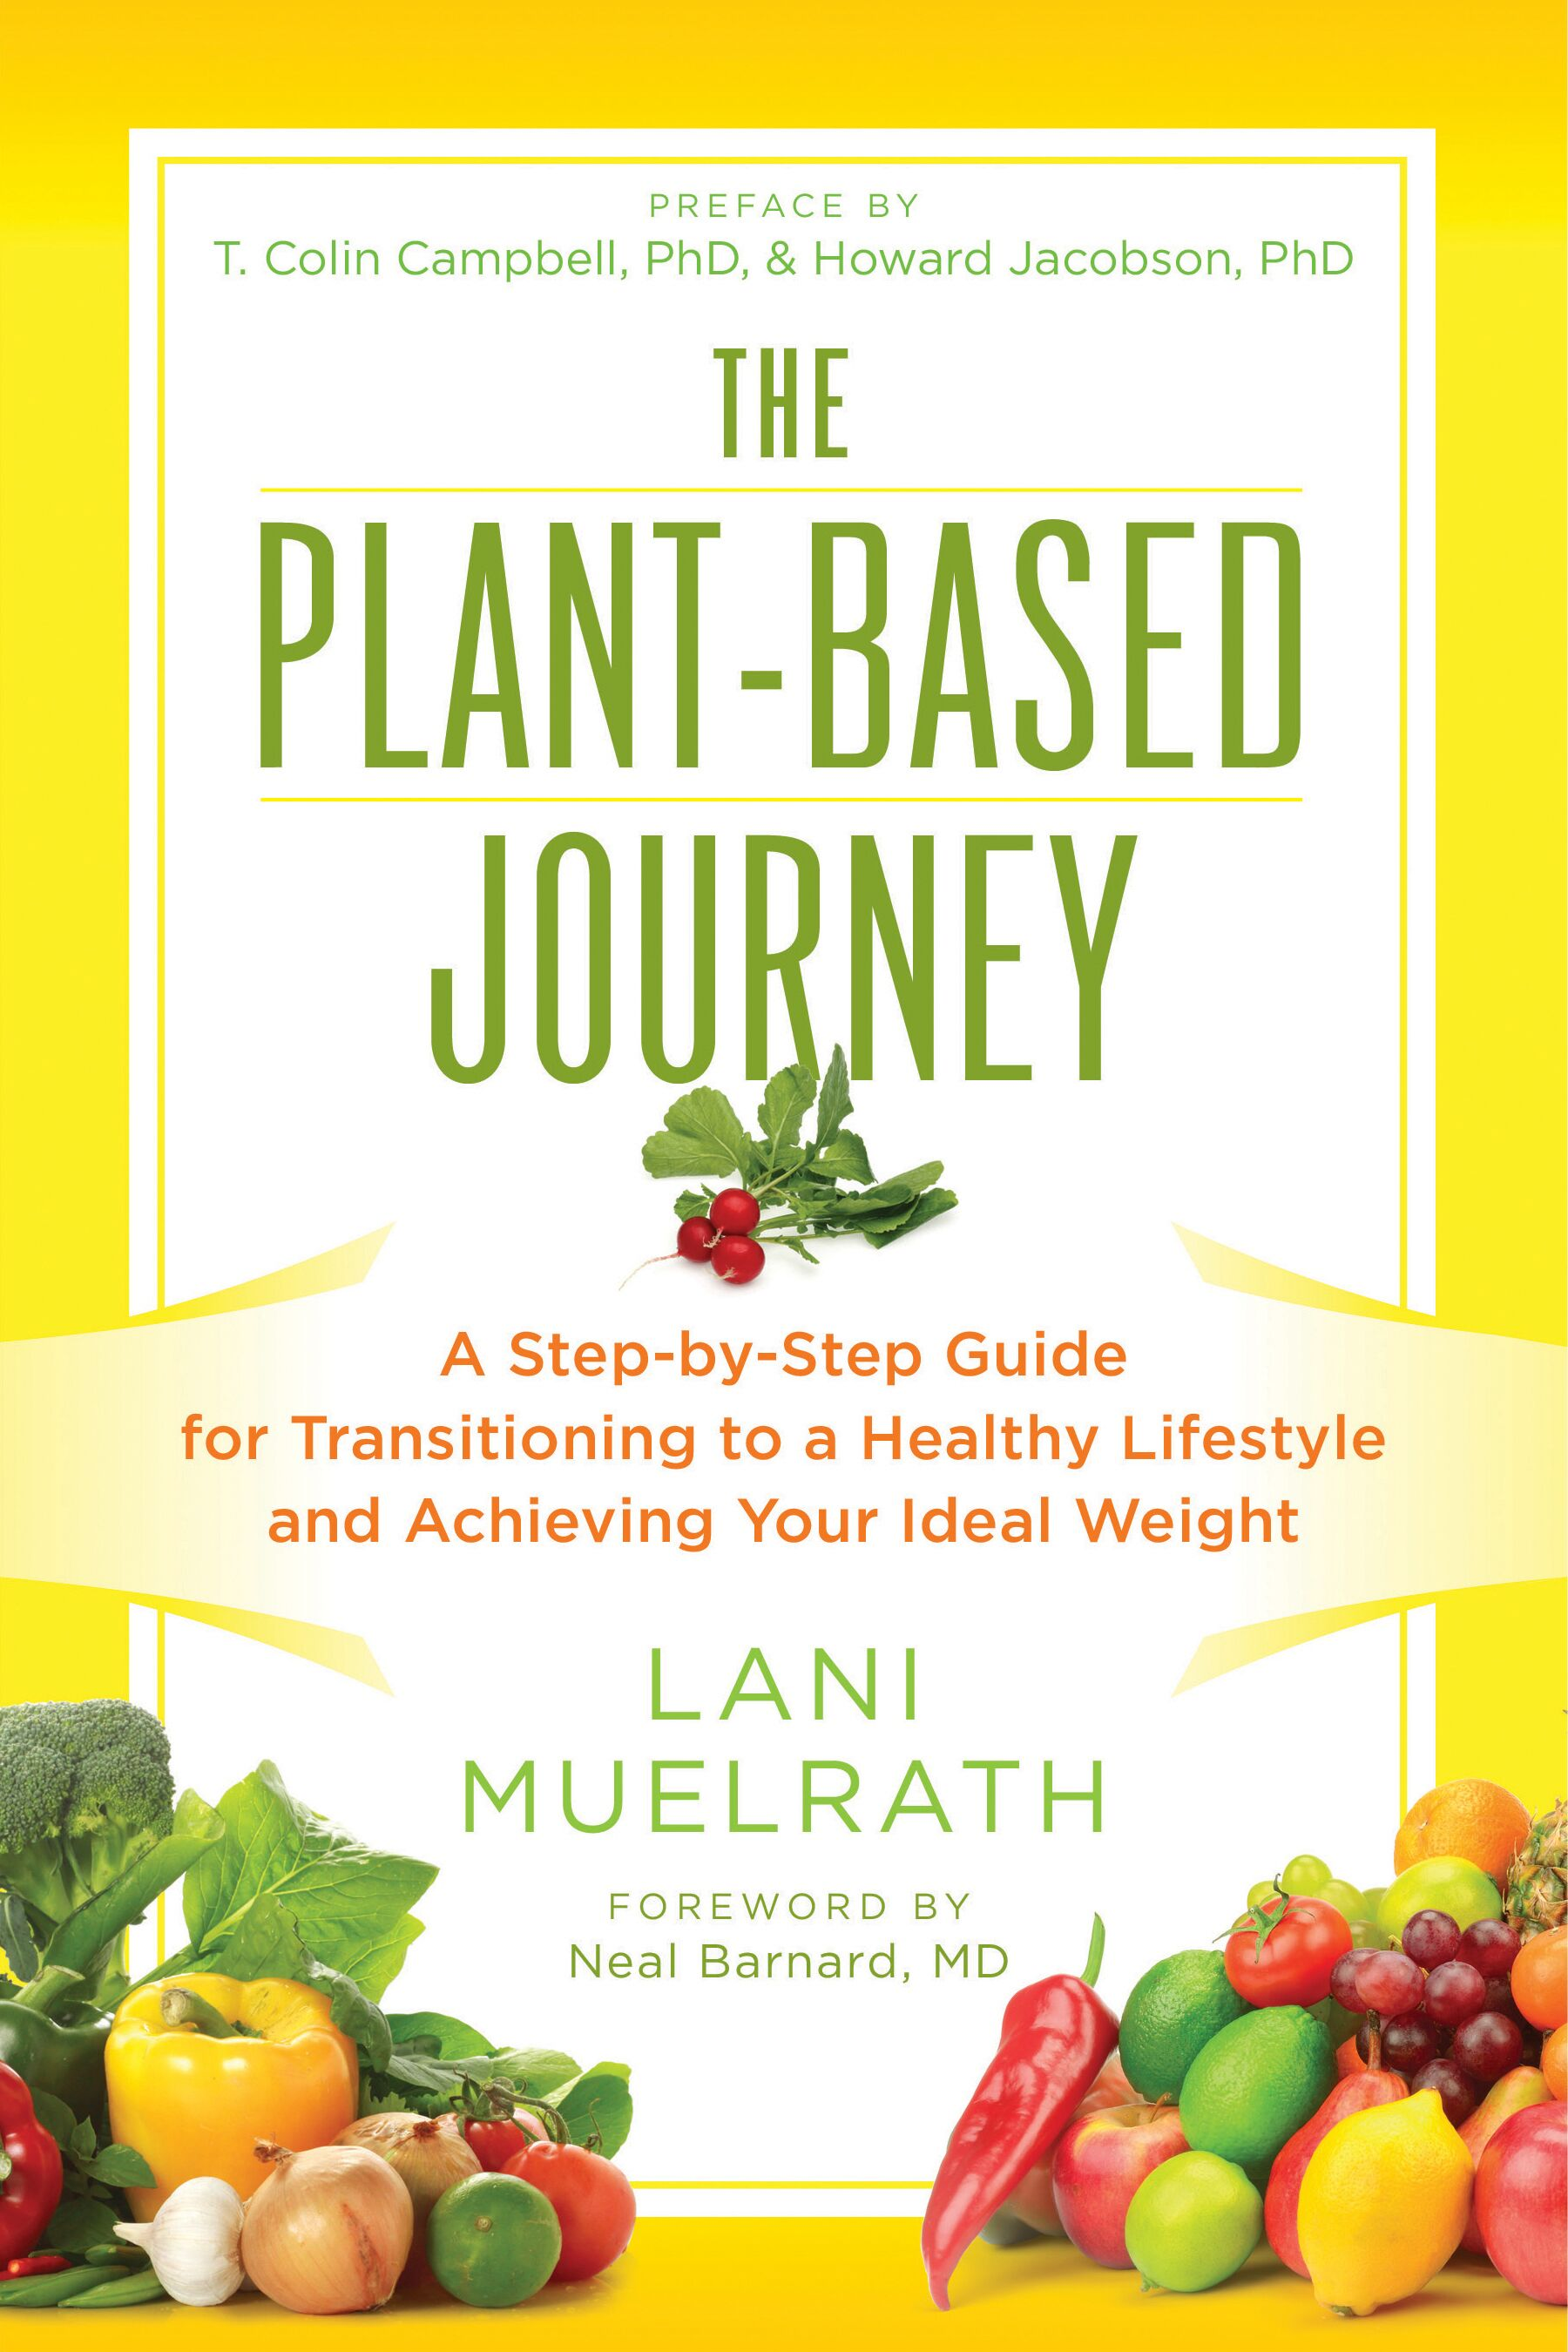 The Plant Based Journey, Lani Muelrath